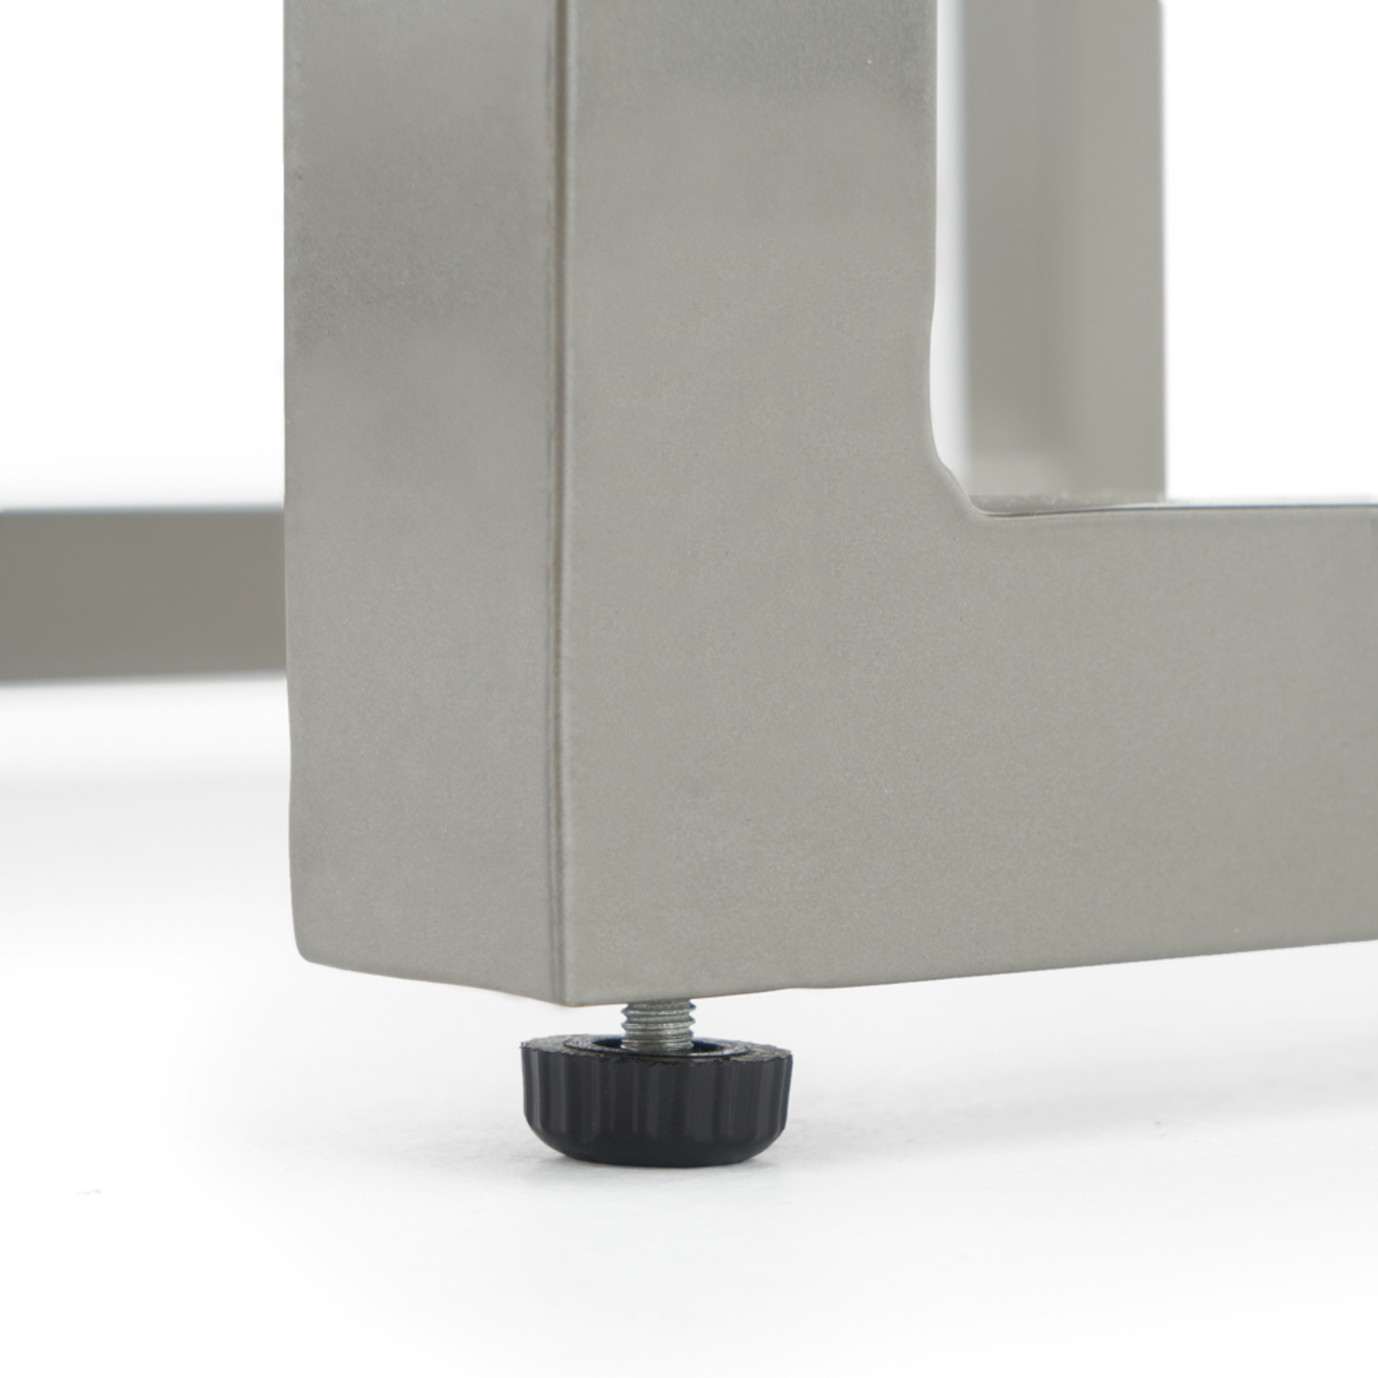 Milo™ Espresso 18pc Estate Set - Slate Gray